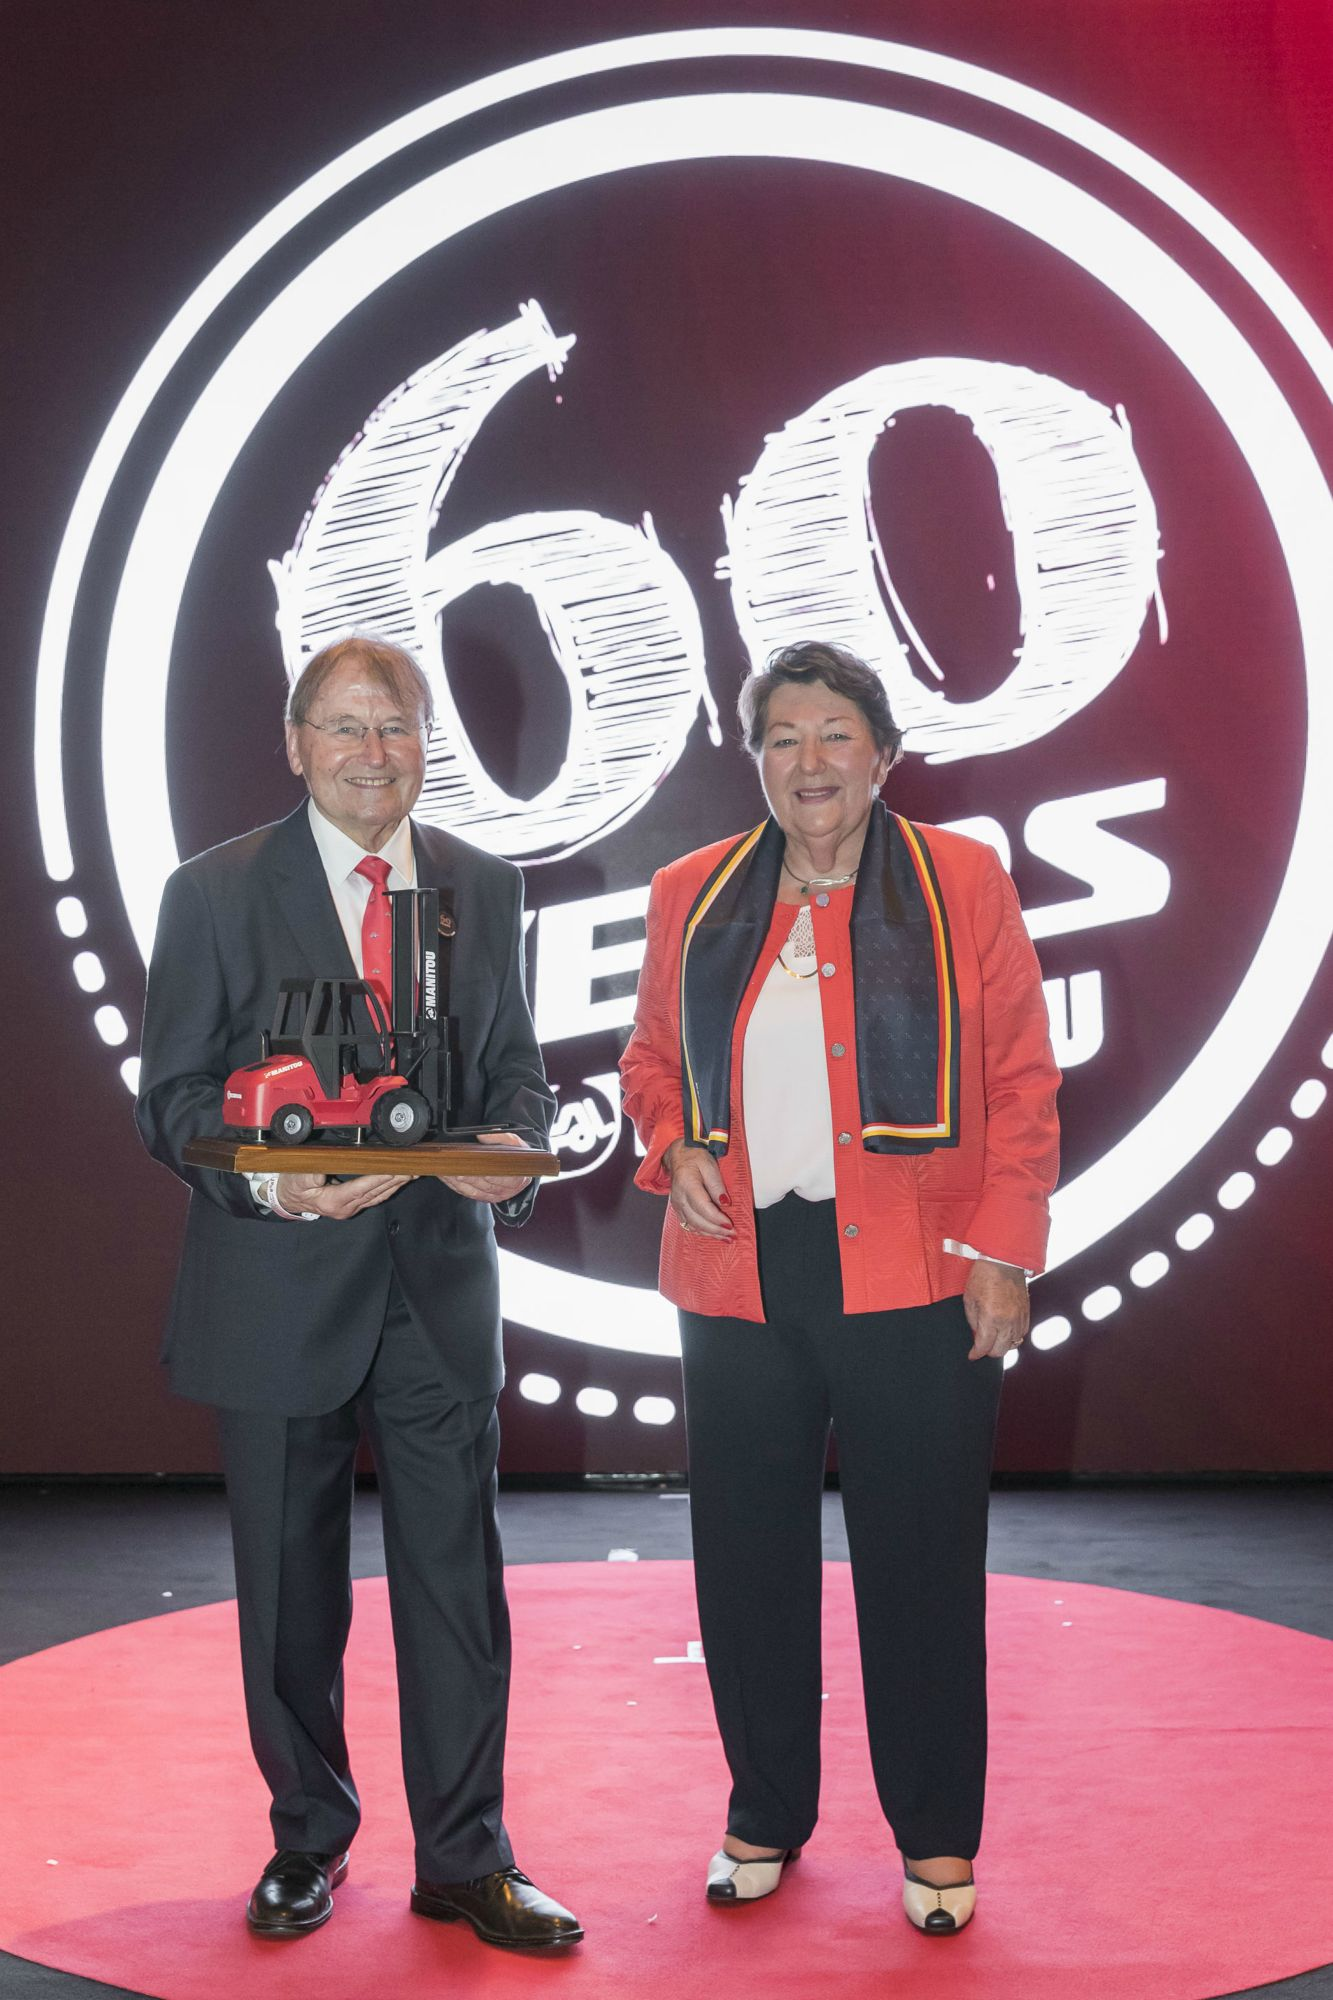 marcel-braud-jacqueline-himsworth Manitou 60 aniversario